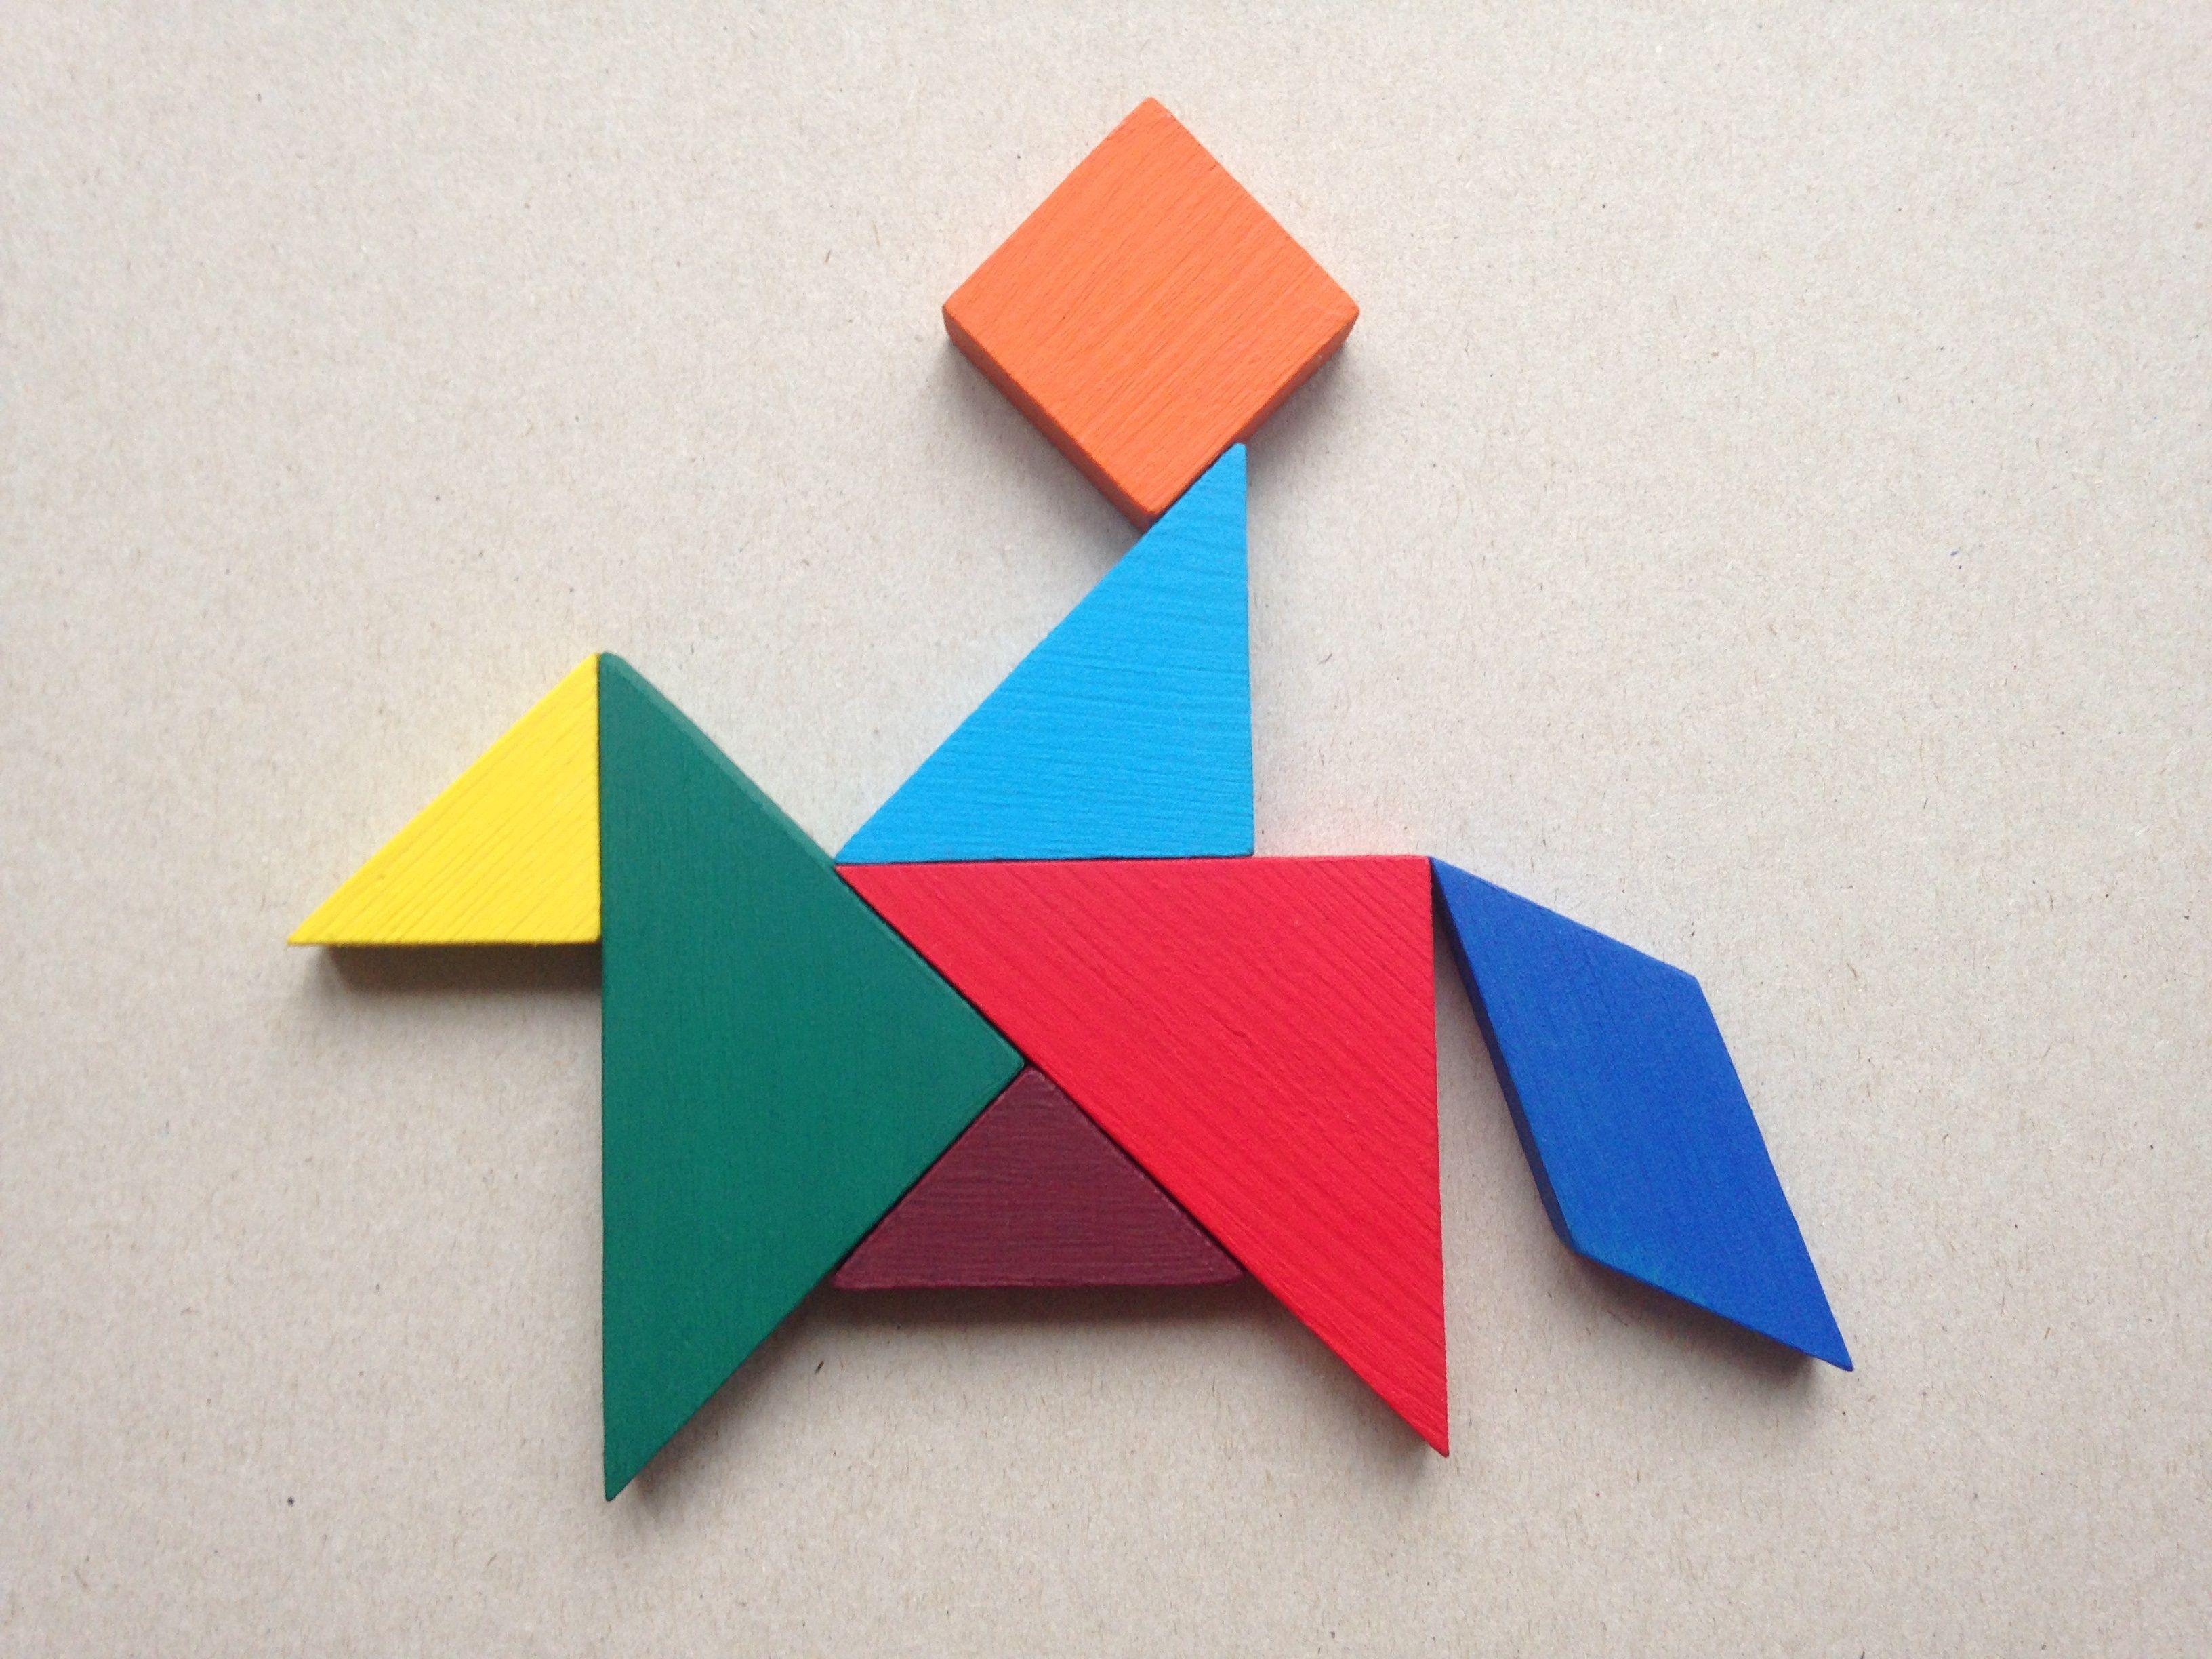 Картинки из треугольника и квадрата